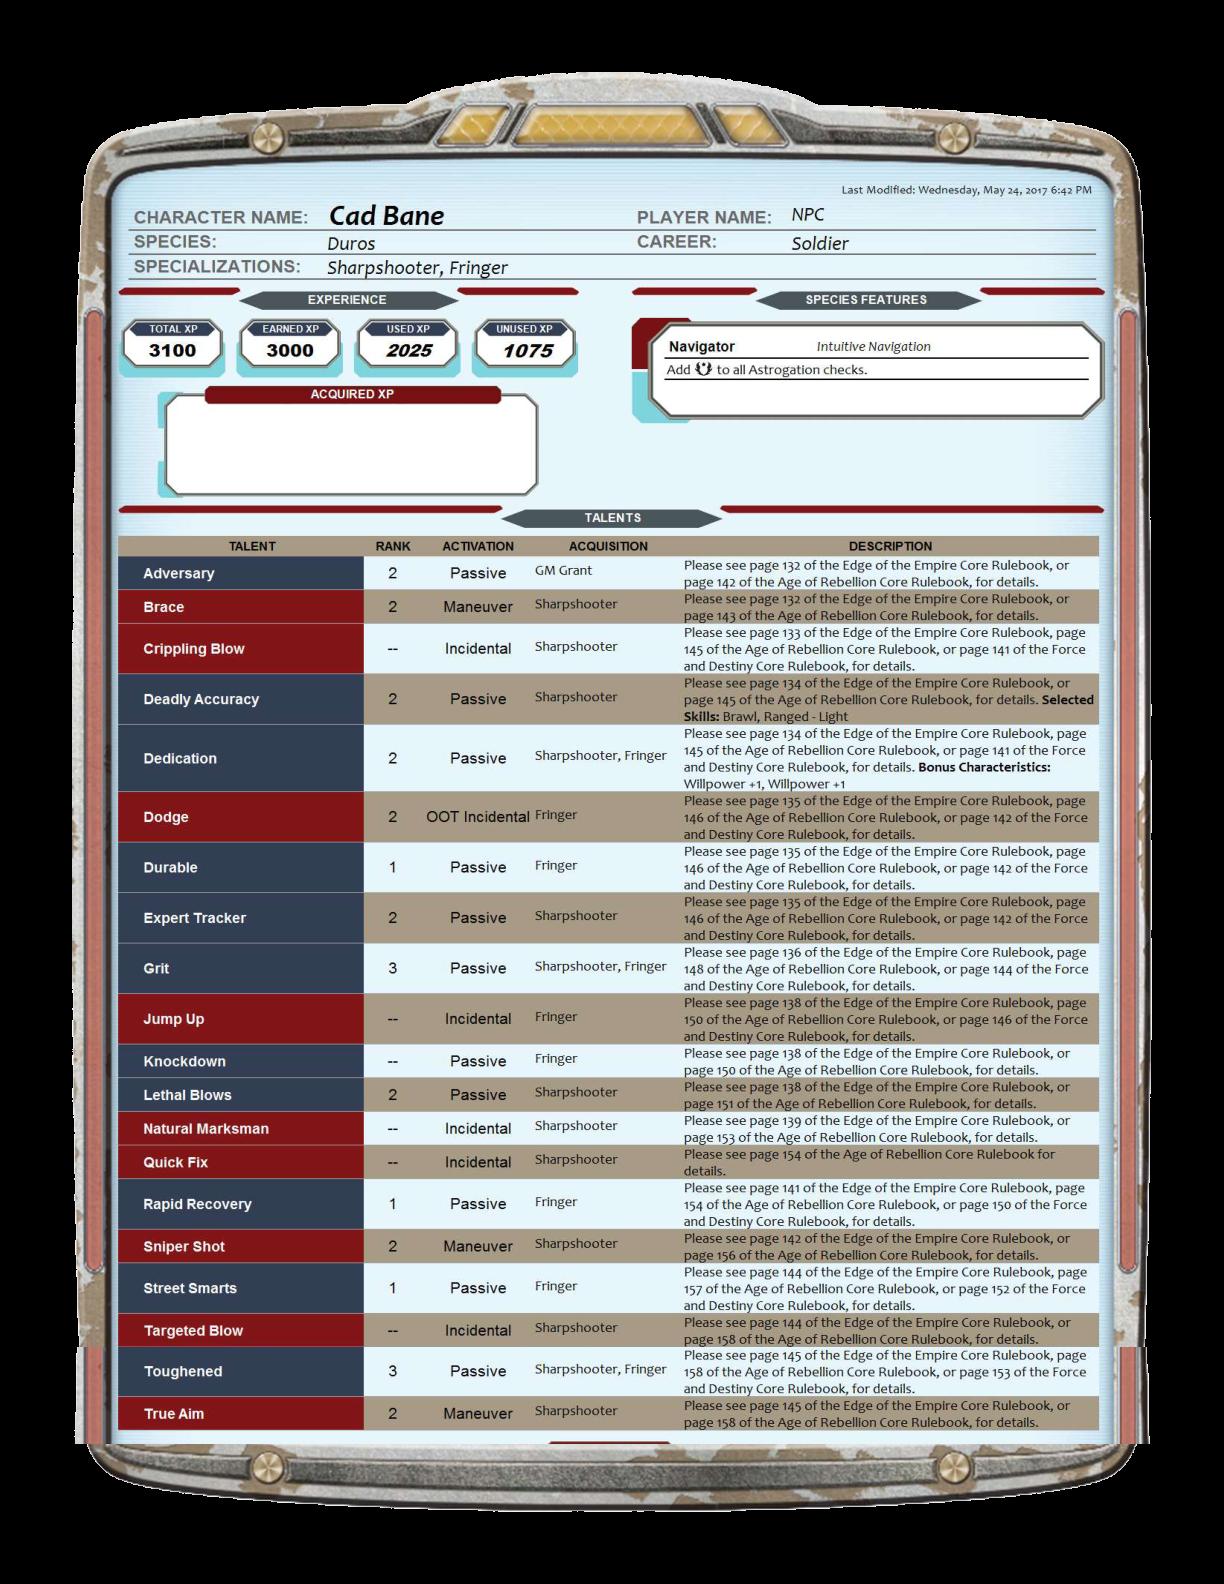 Cad_Bane_info_sheet_2.png